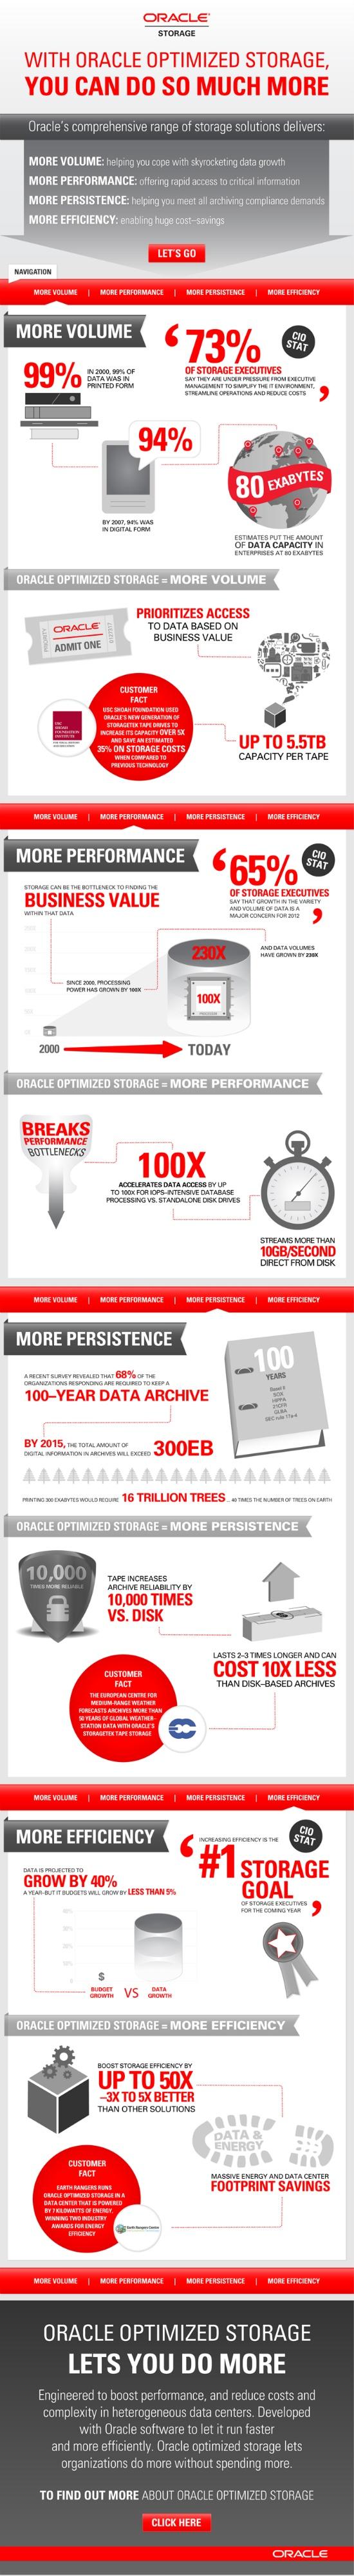 Oracle Optimized Storage = More Volume.  More Performance.  More Persistence.  More Efficiency.: Optimism Storage, Oracle Optimism